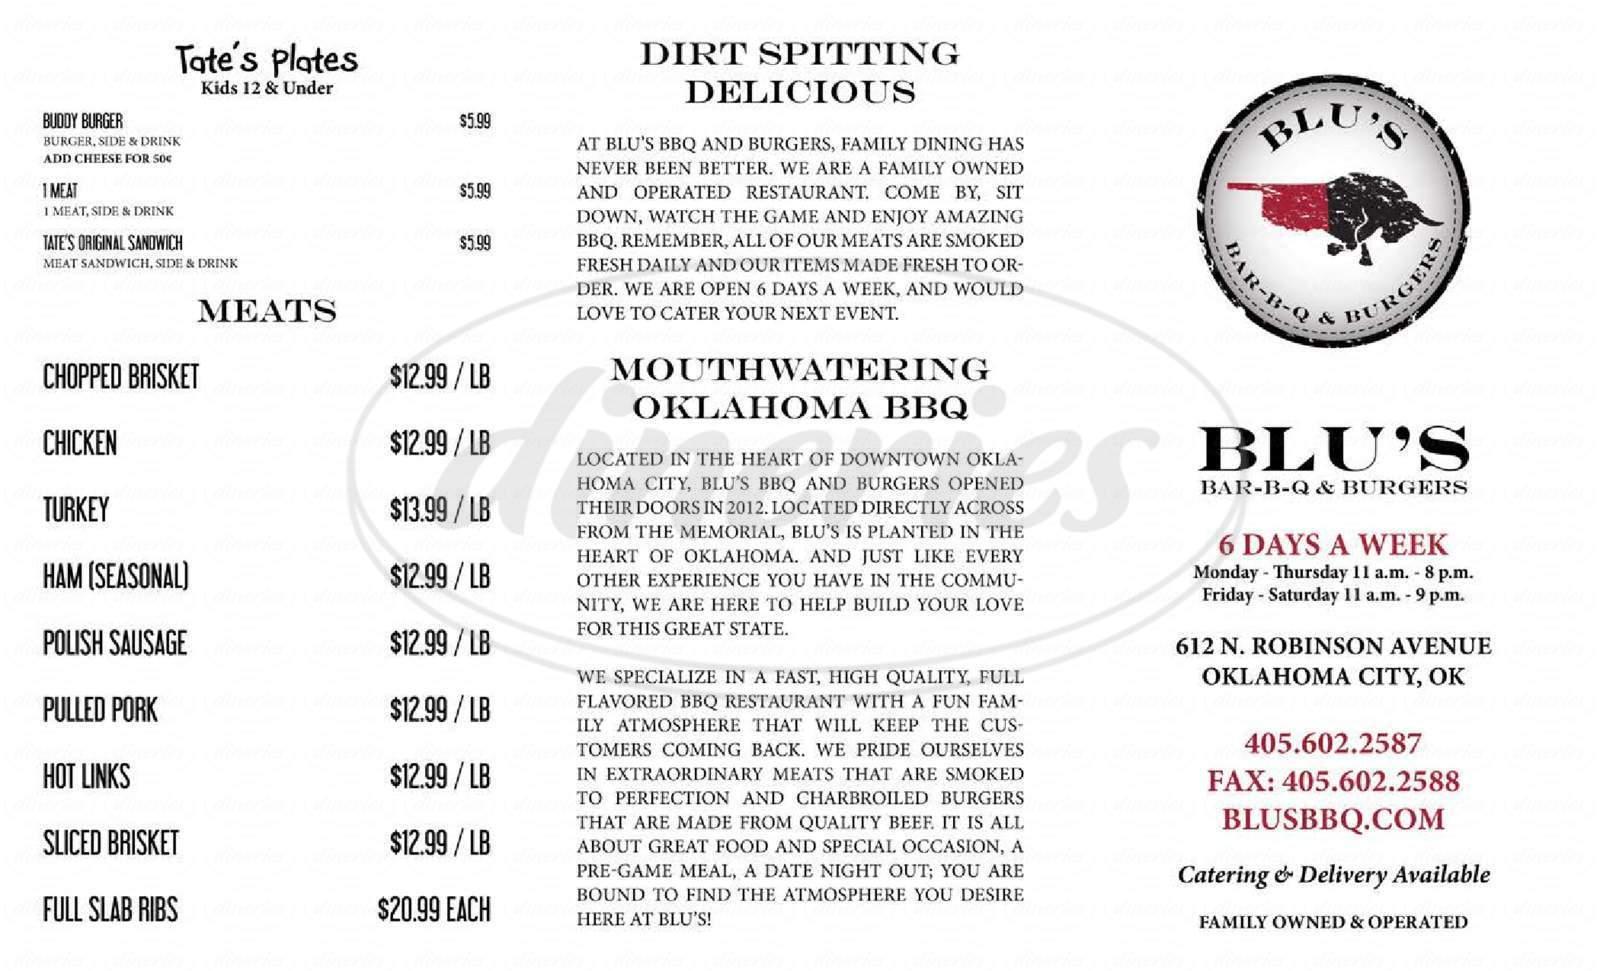 menu for Blu's BBQ and Burgers